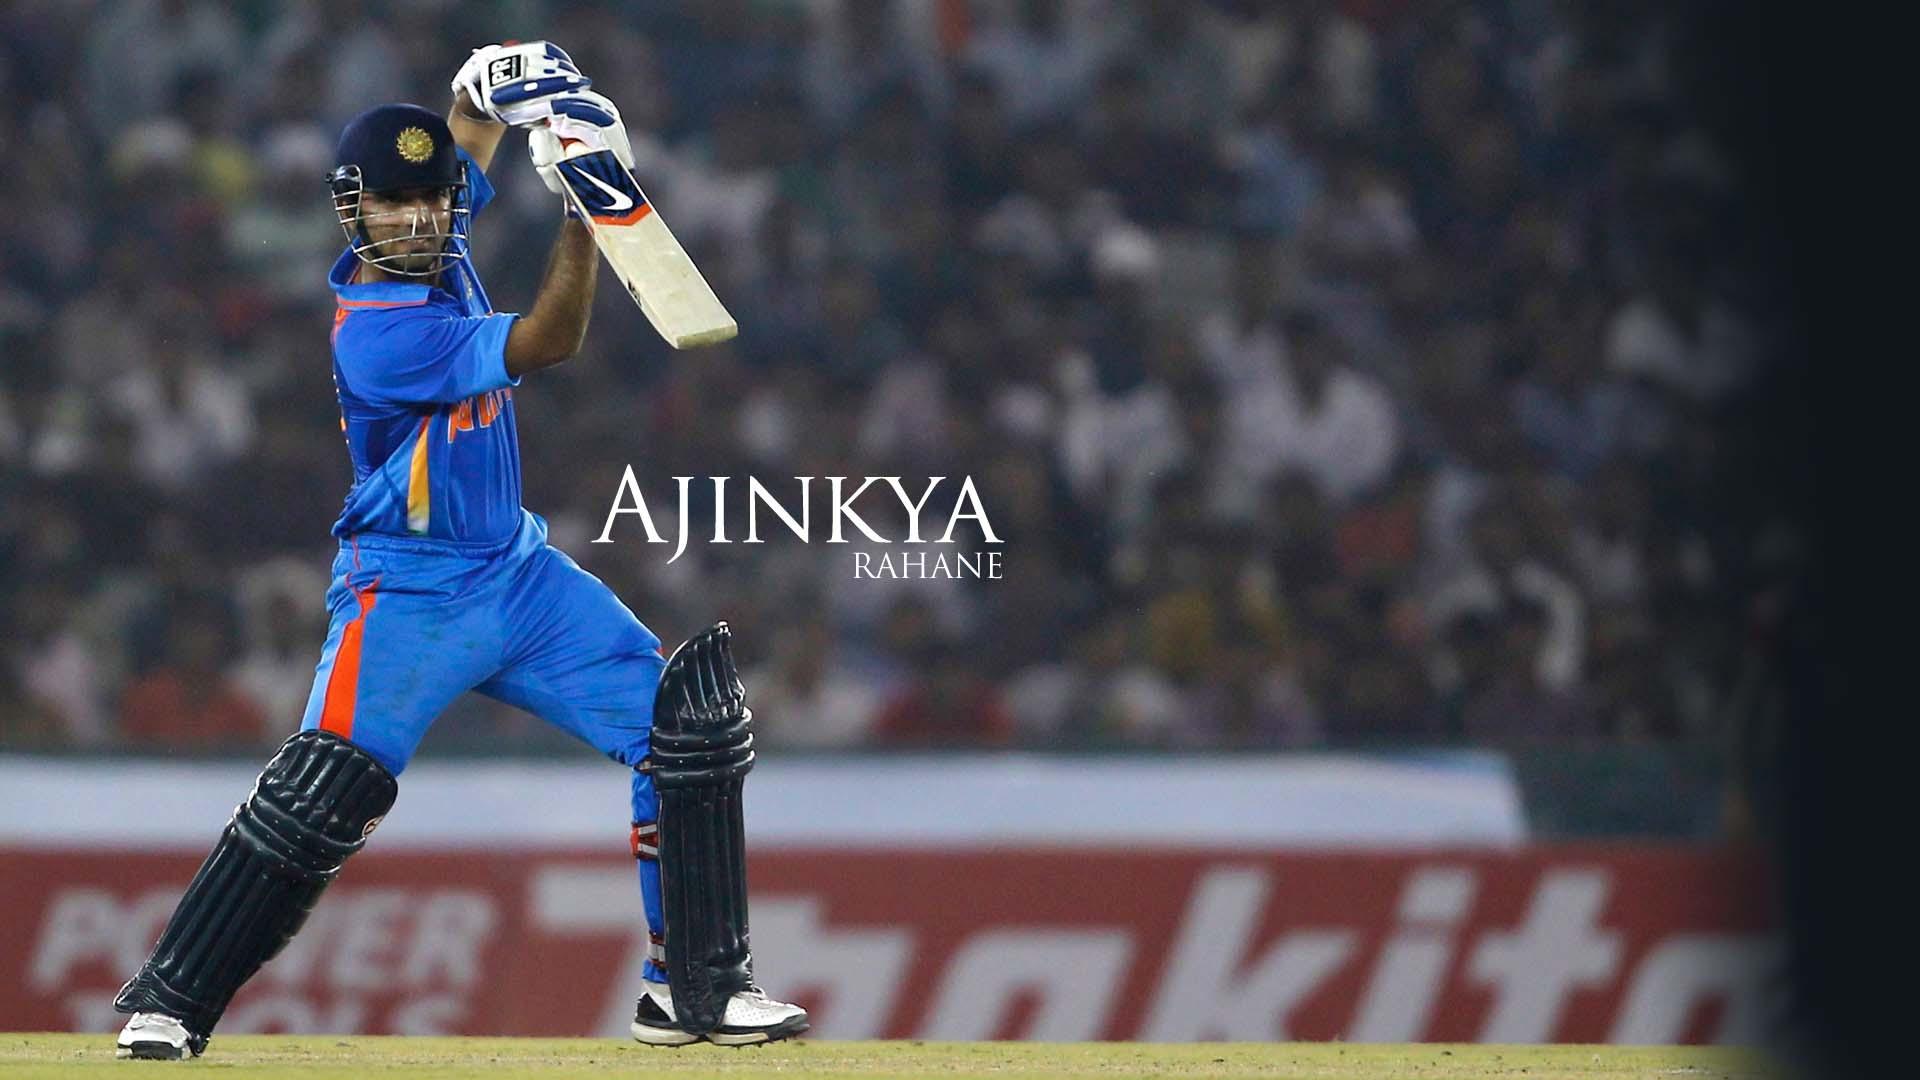 Ajinkya-Rahane-indian-cricketer-Indian-cricketer-Cricket-bat-ball-ravindra-jadeja-wallpaper-wpc5802005